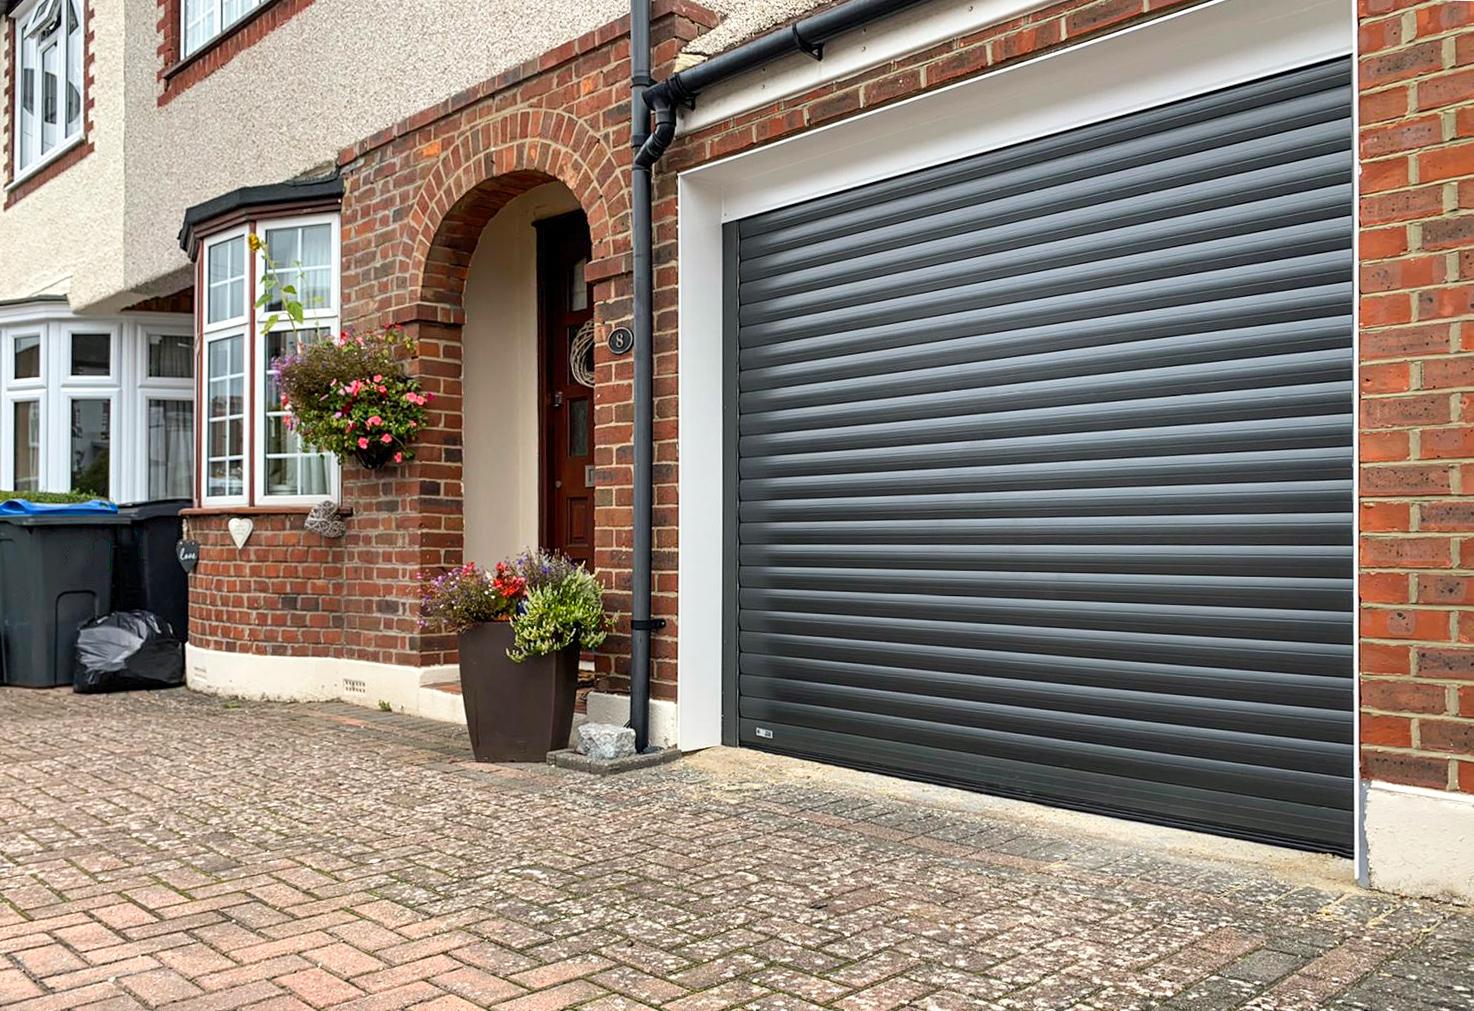 SWS SeceuroGlide Original Insulated Roller Garage Door Finished in Graphite Grey